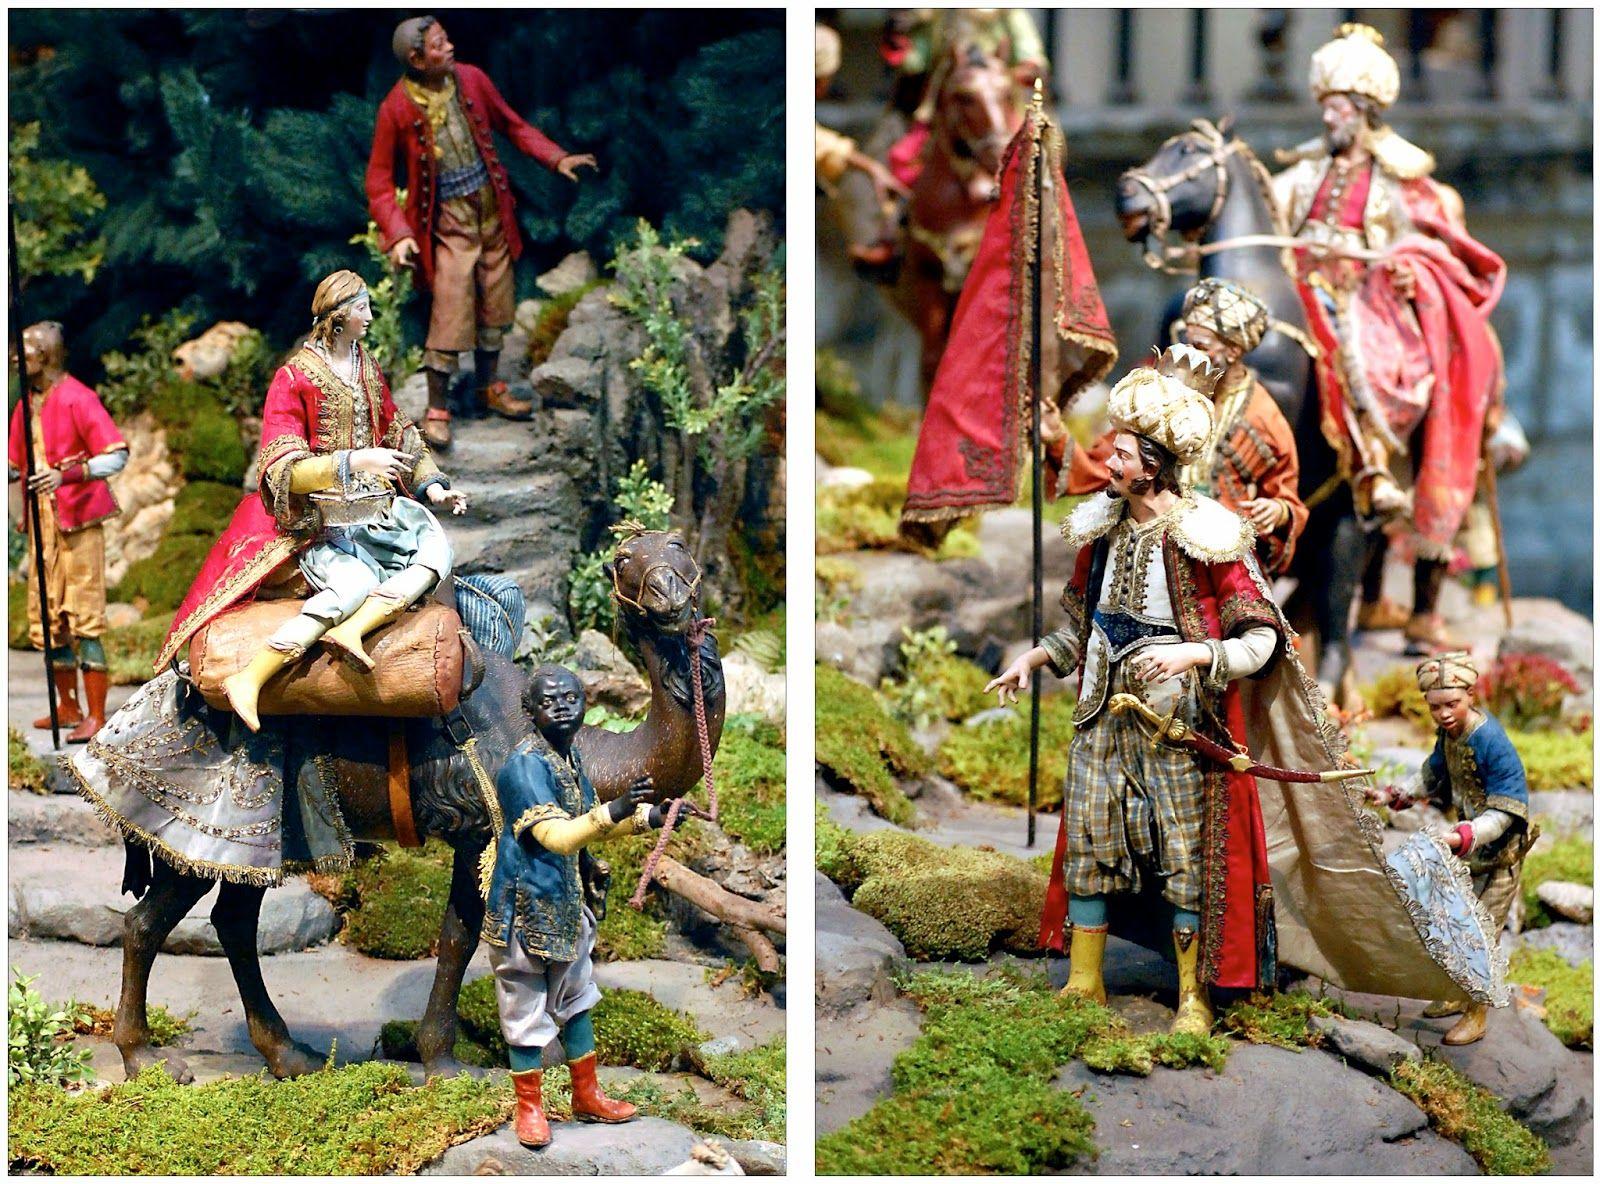 Pin by Kelly on Nativity Creche | Modern christmas ornaments, Angel tree, Nativity creche